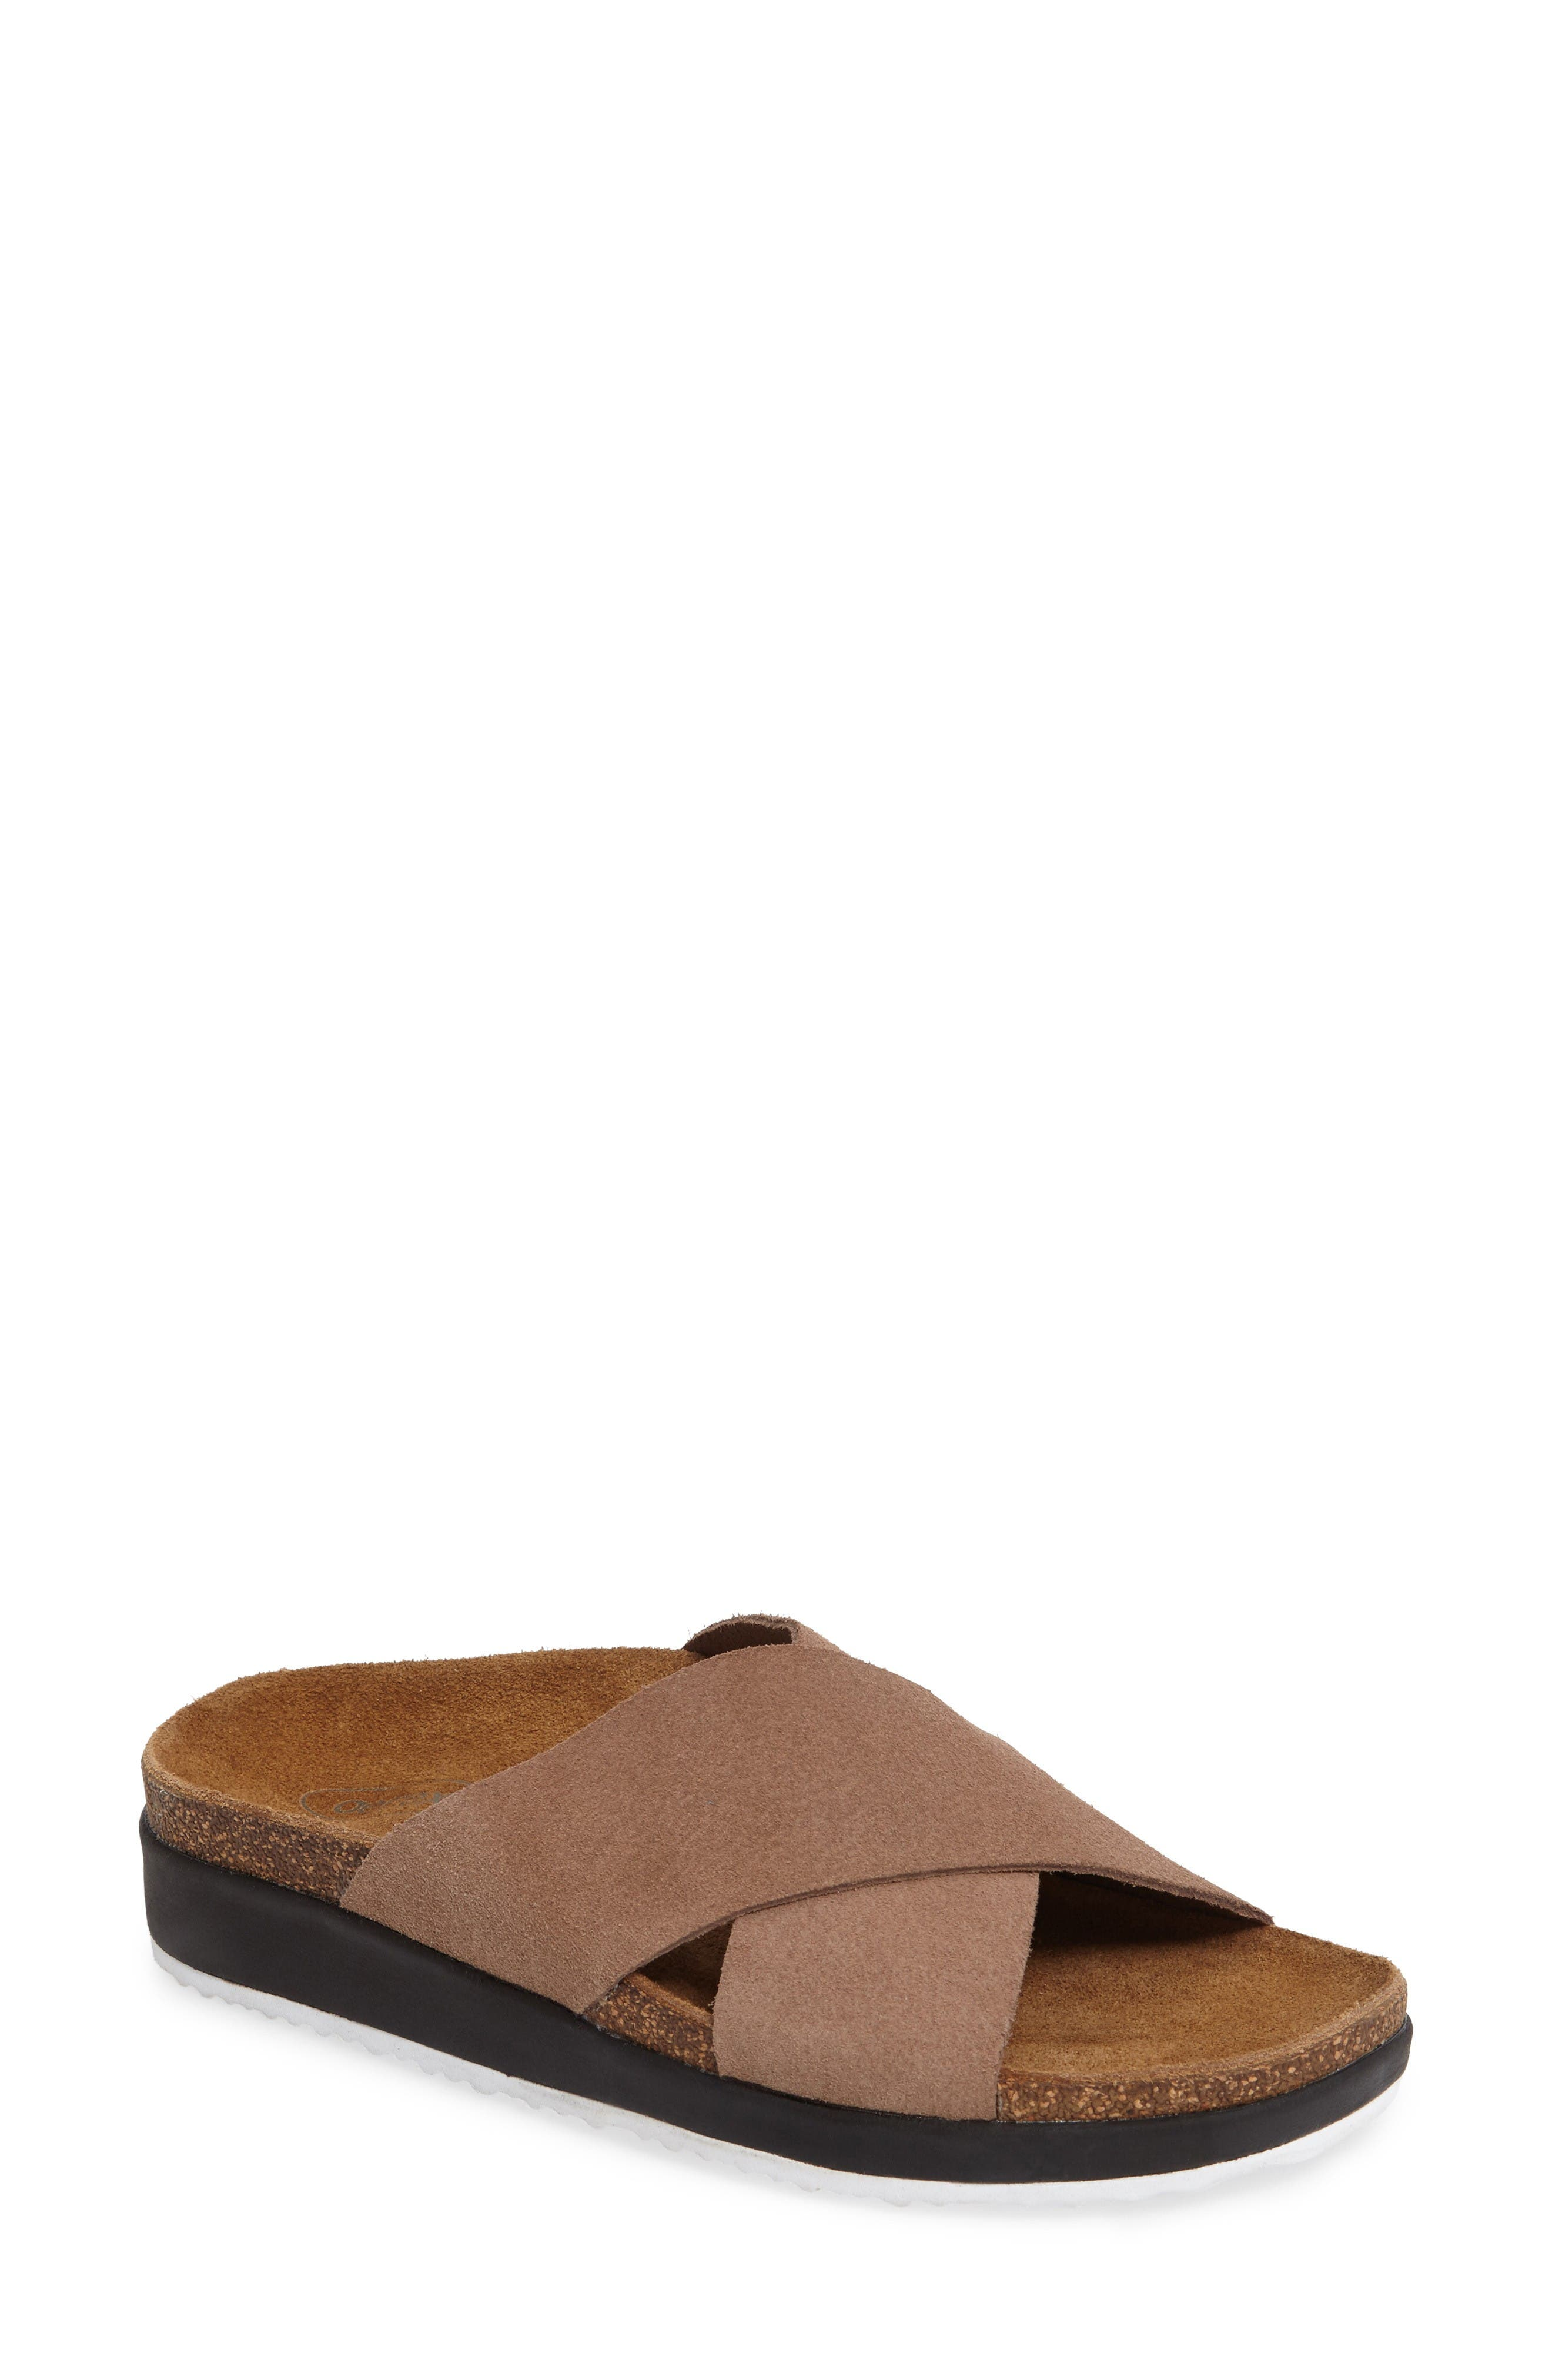 AETREX Dawn Slide Sandal